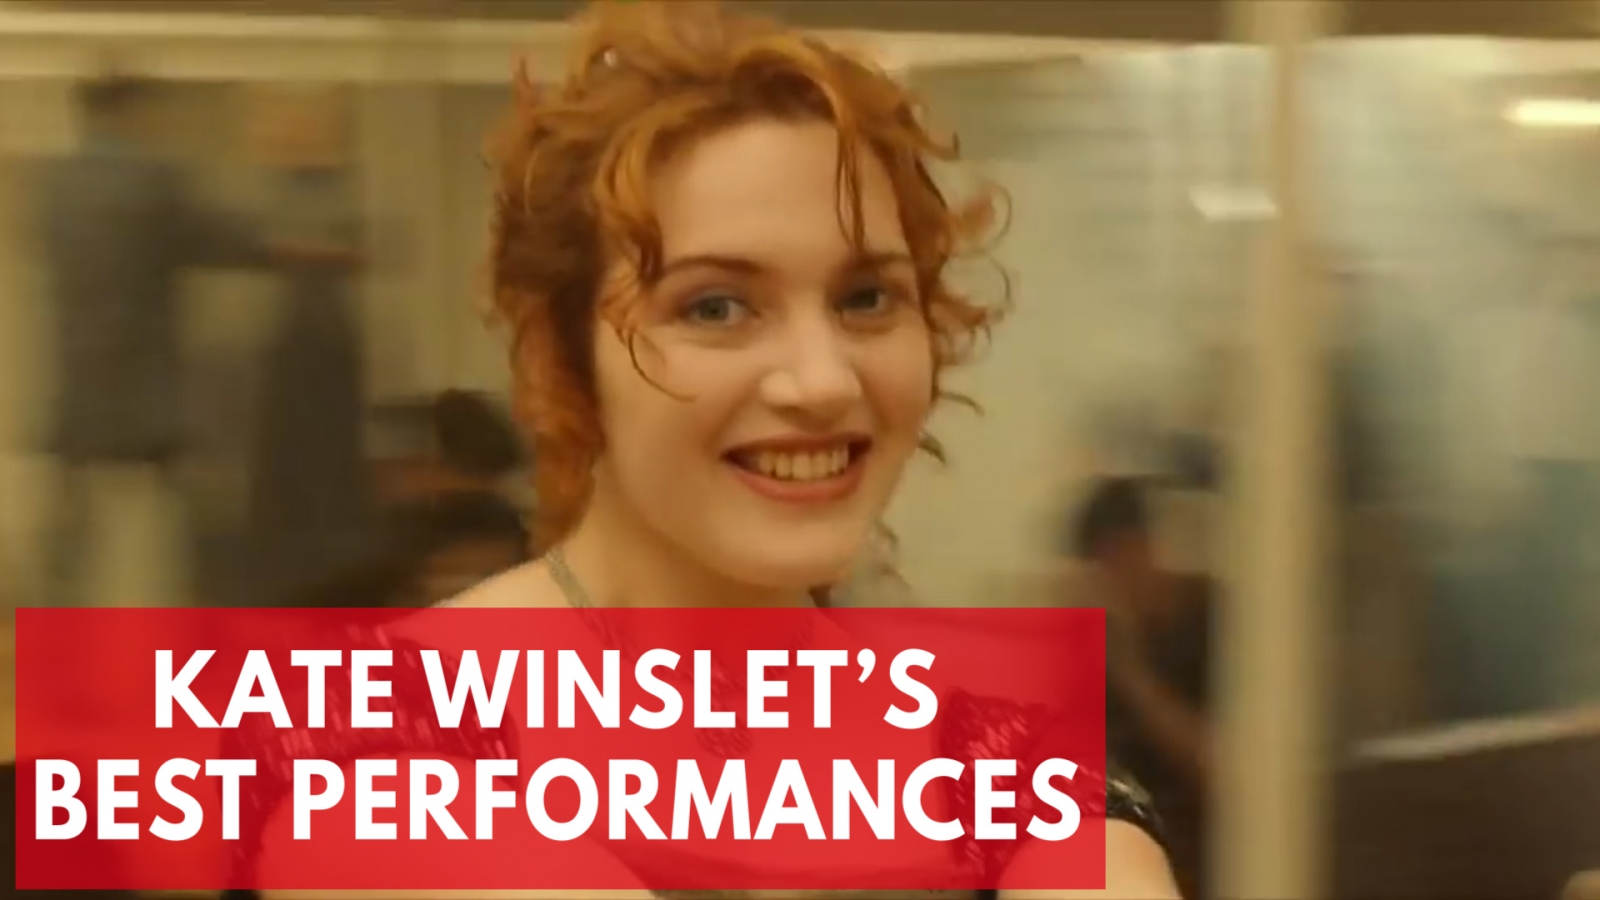 Kate Winslet's best performances